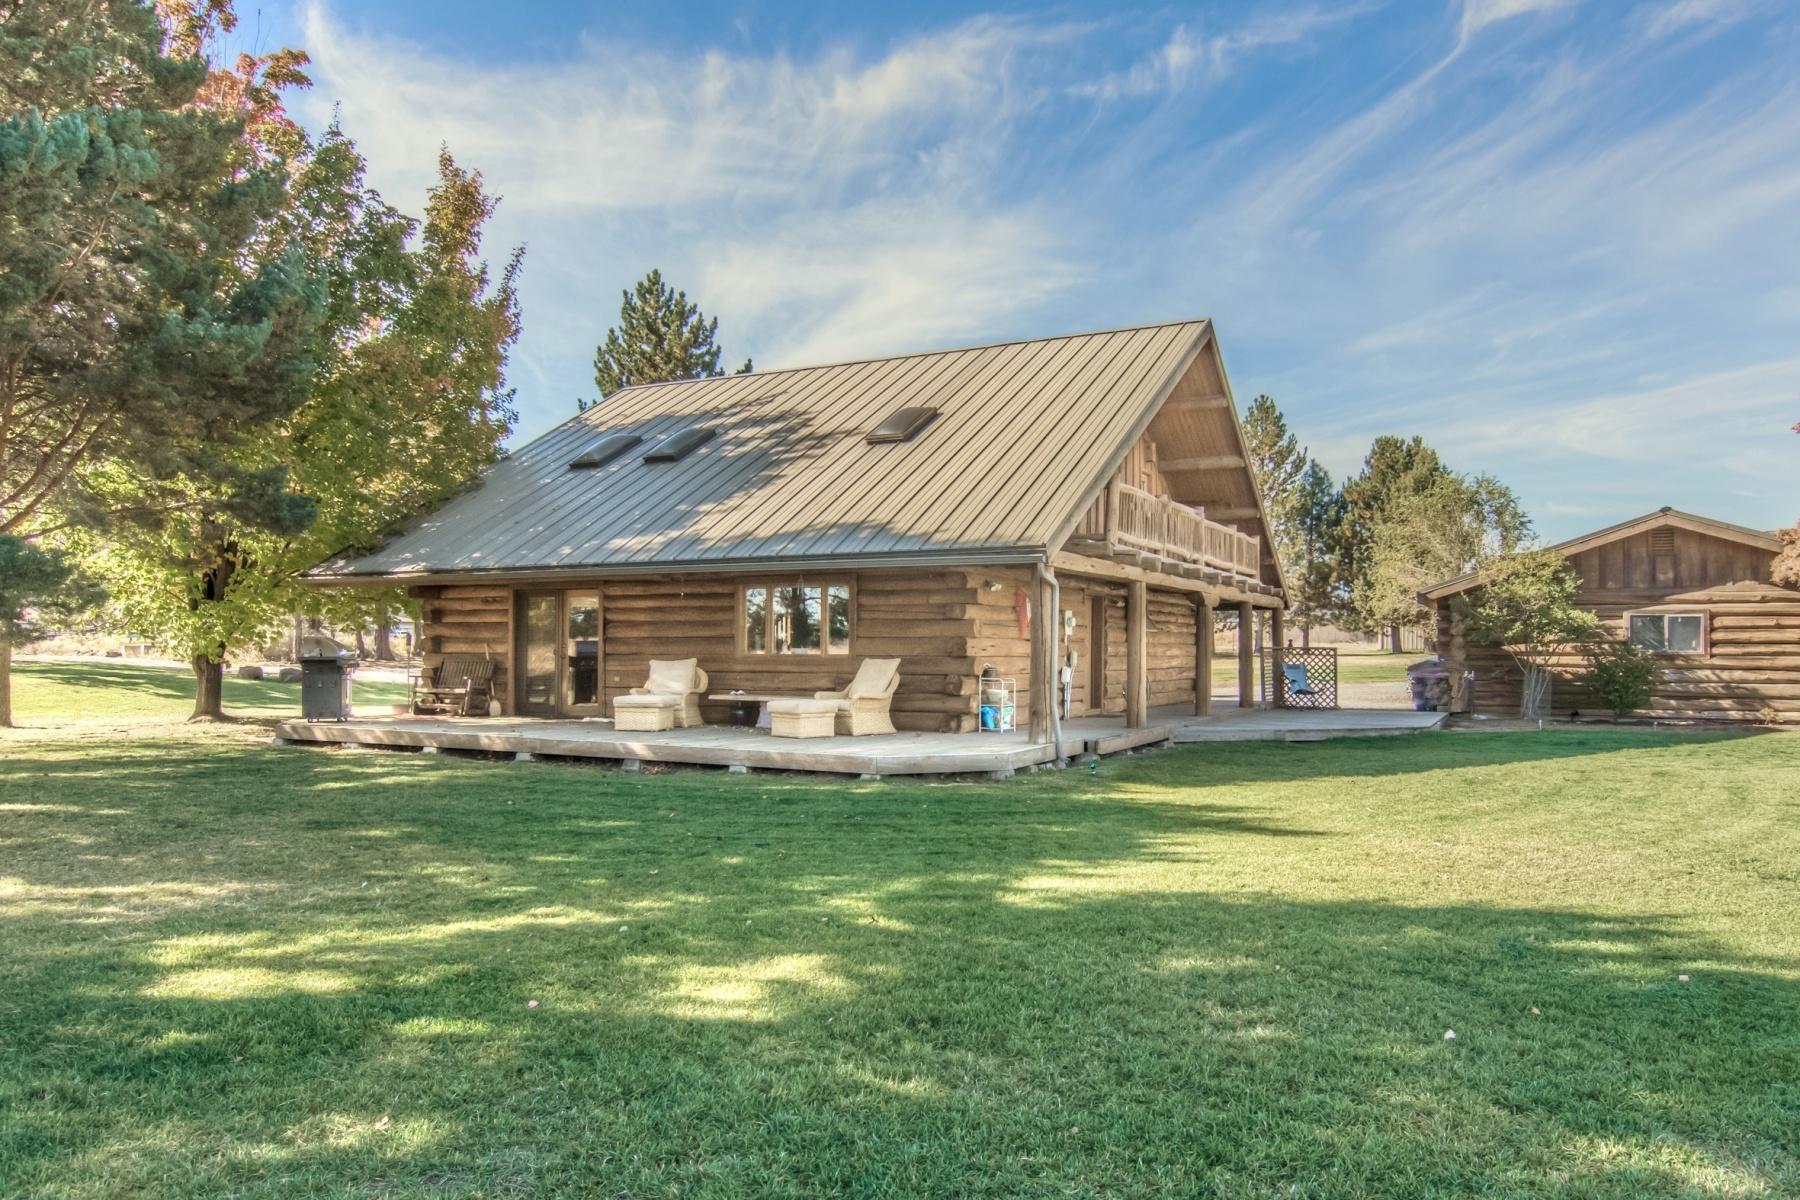 独户住宅 为 销售 在 Oregon Log Home with Land 63357 Deschutes Market Rd 本德, 俄勒冈州, 97701 美国